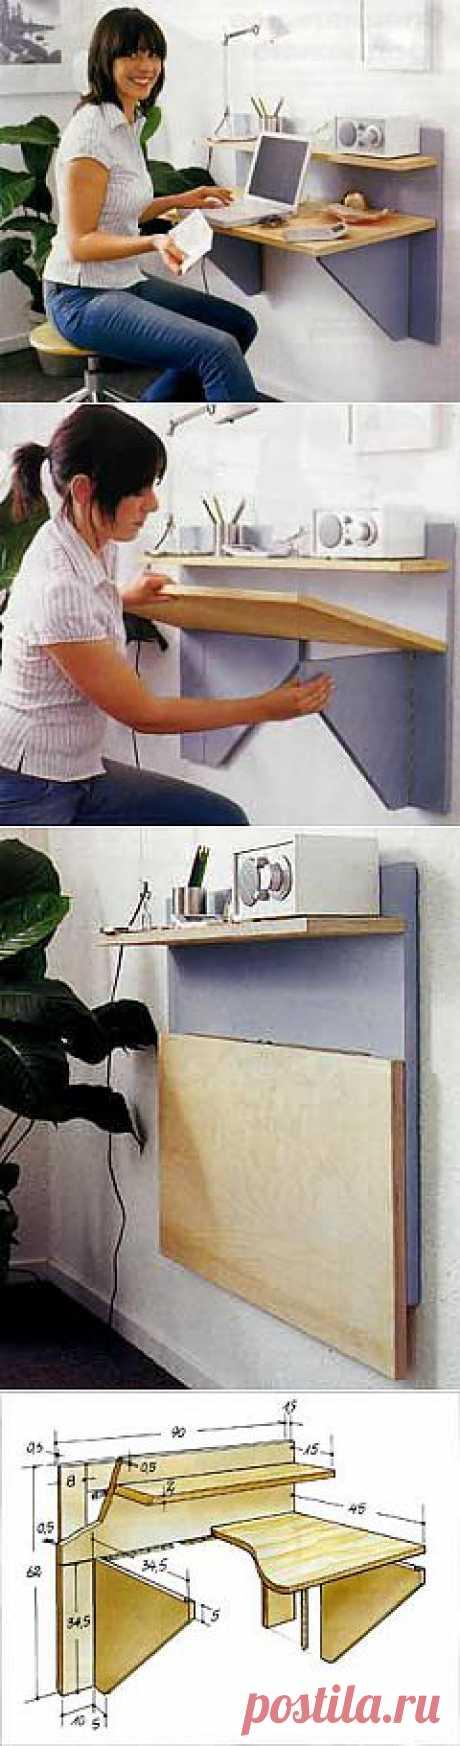 Invisible table. Furniture - a transformer.